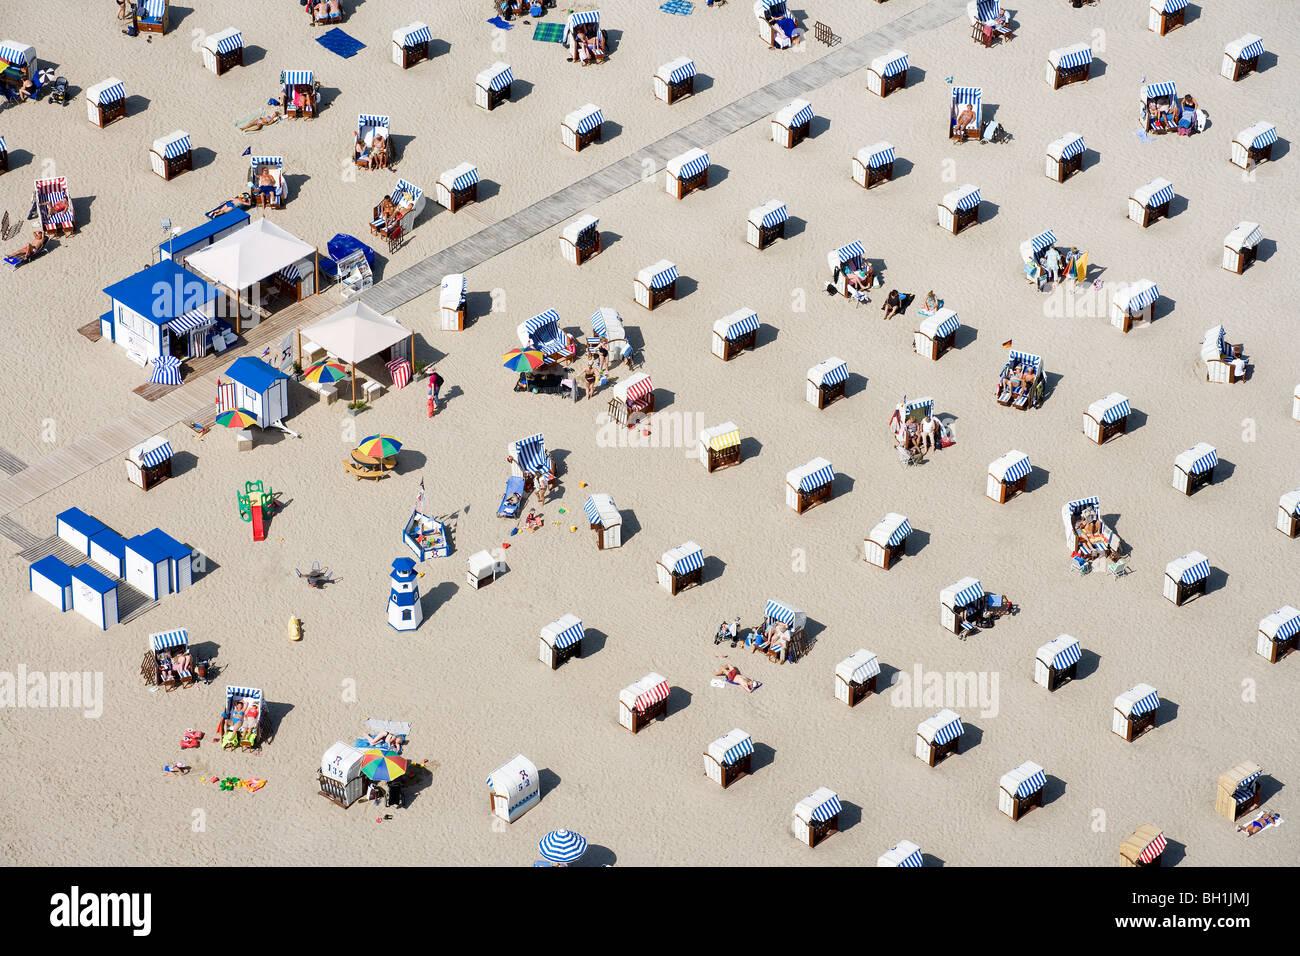 High angle view à plage avec chaises de plage au soleil, Travemünde, Schleswig Holstein, Allemagne, Europe Photo Stock